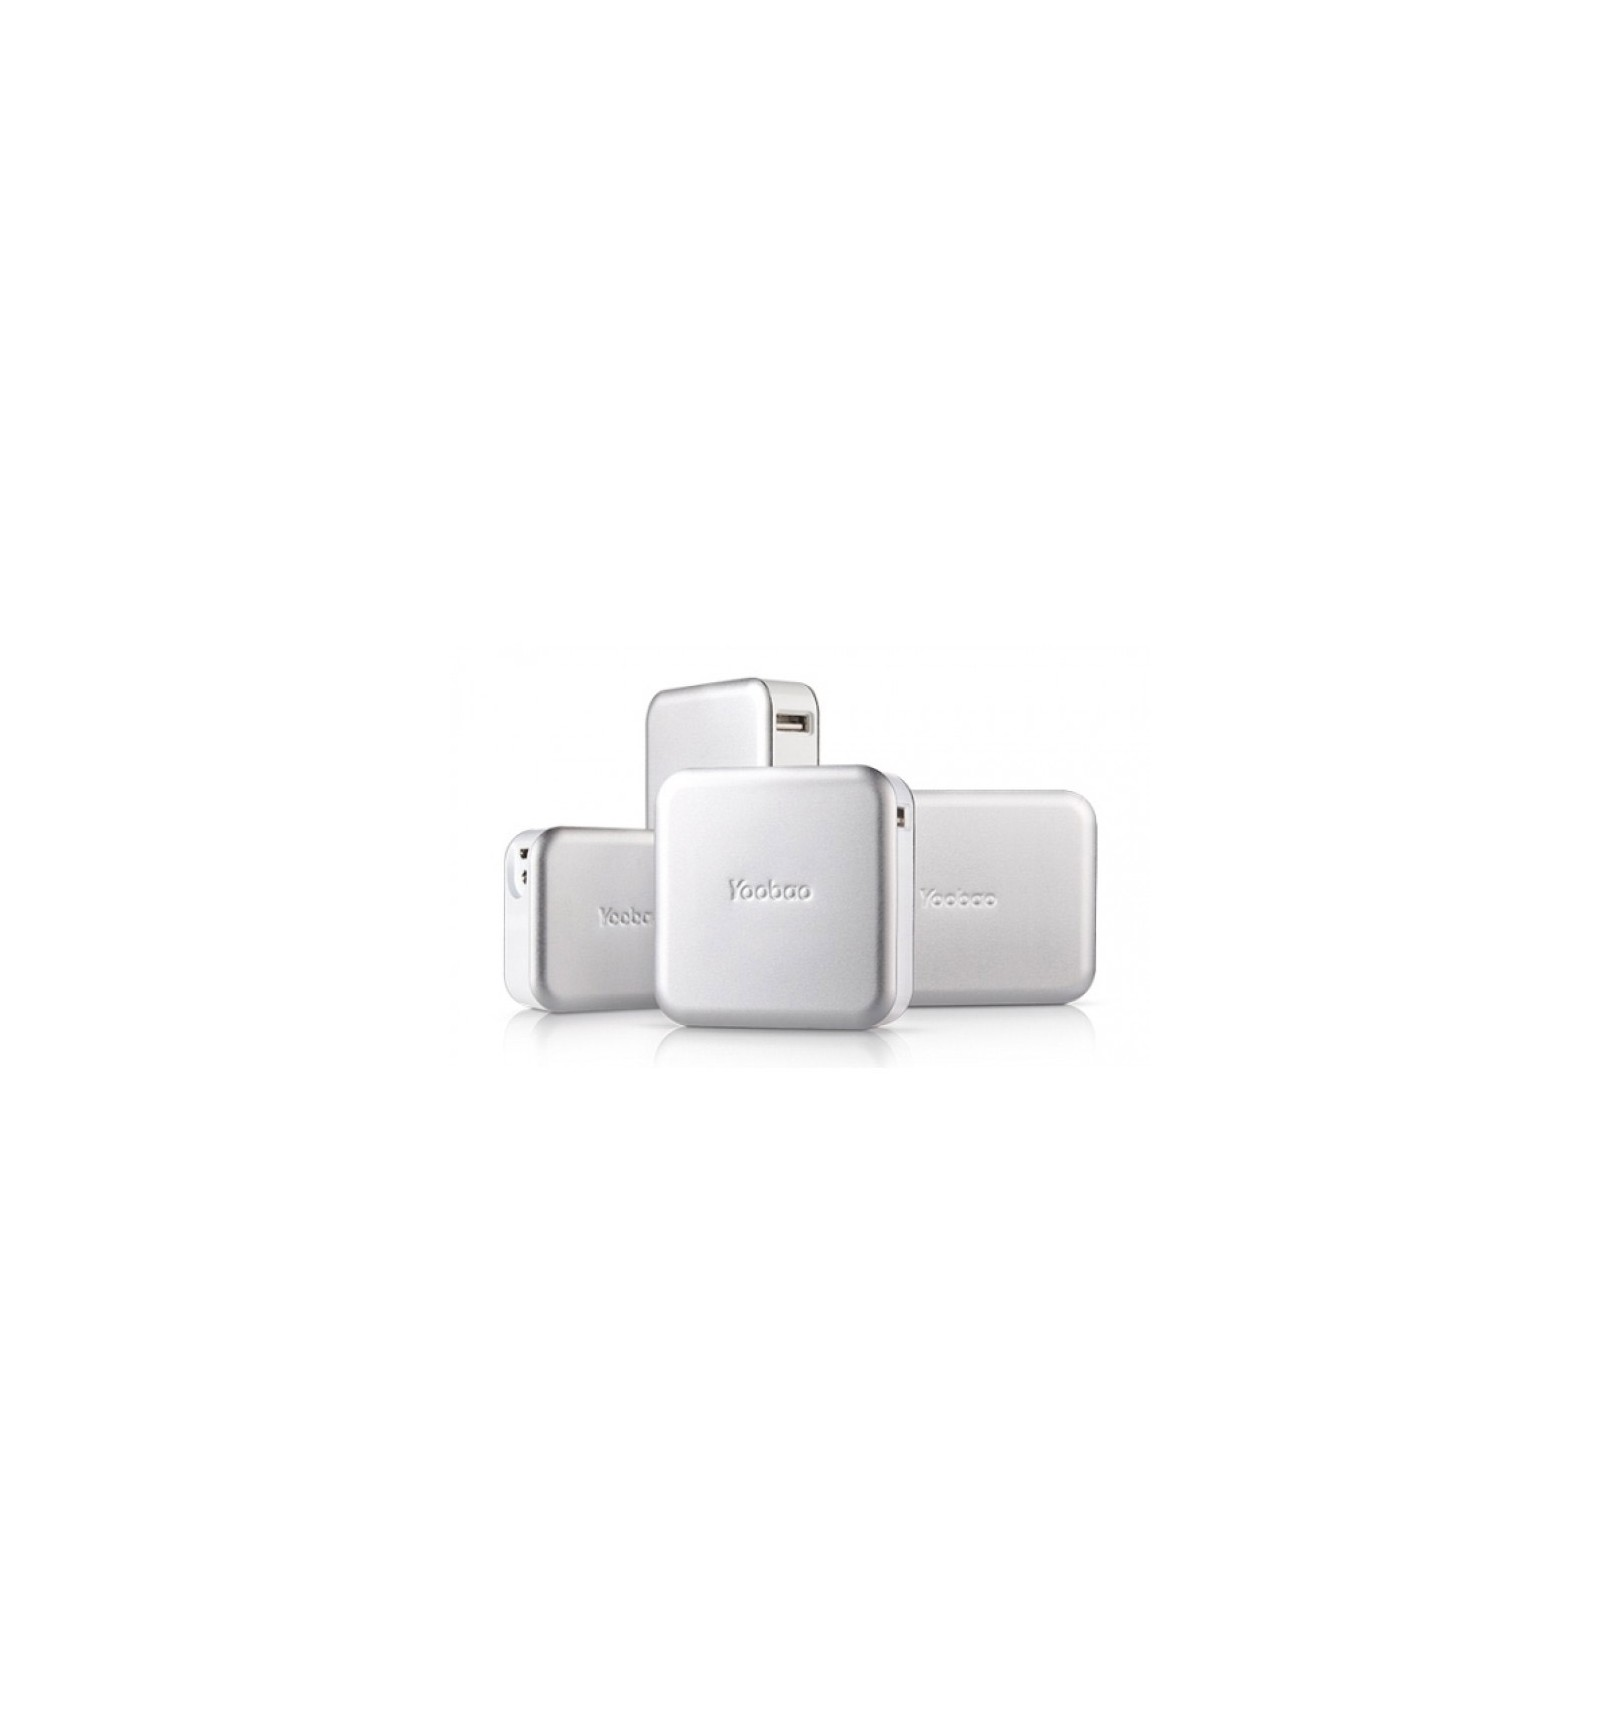 yoobao magic cube ii 7800 power bank. Black Bedroom Furniture Sets. Home Design Ideas